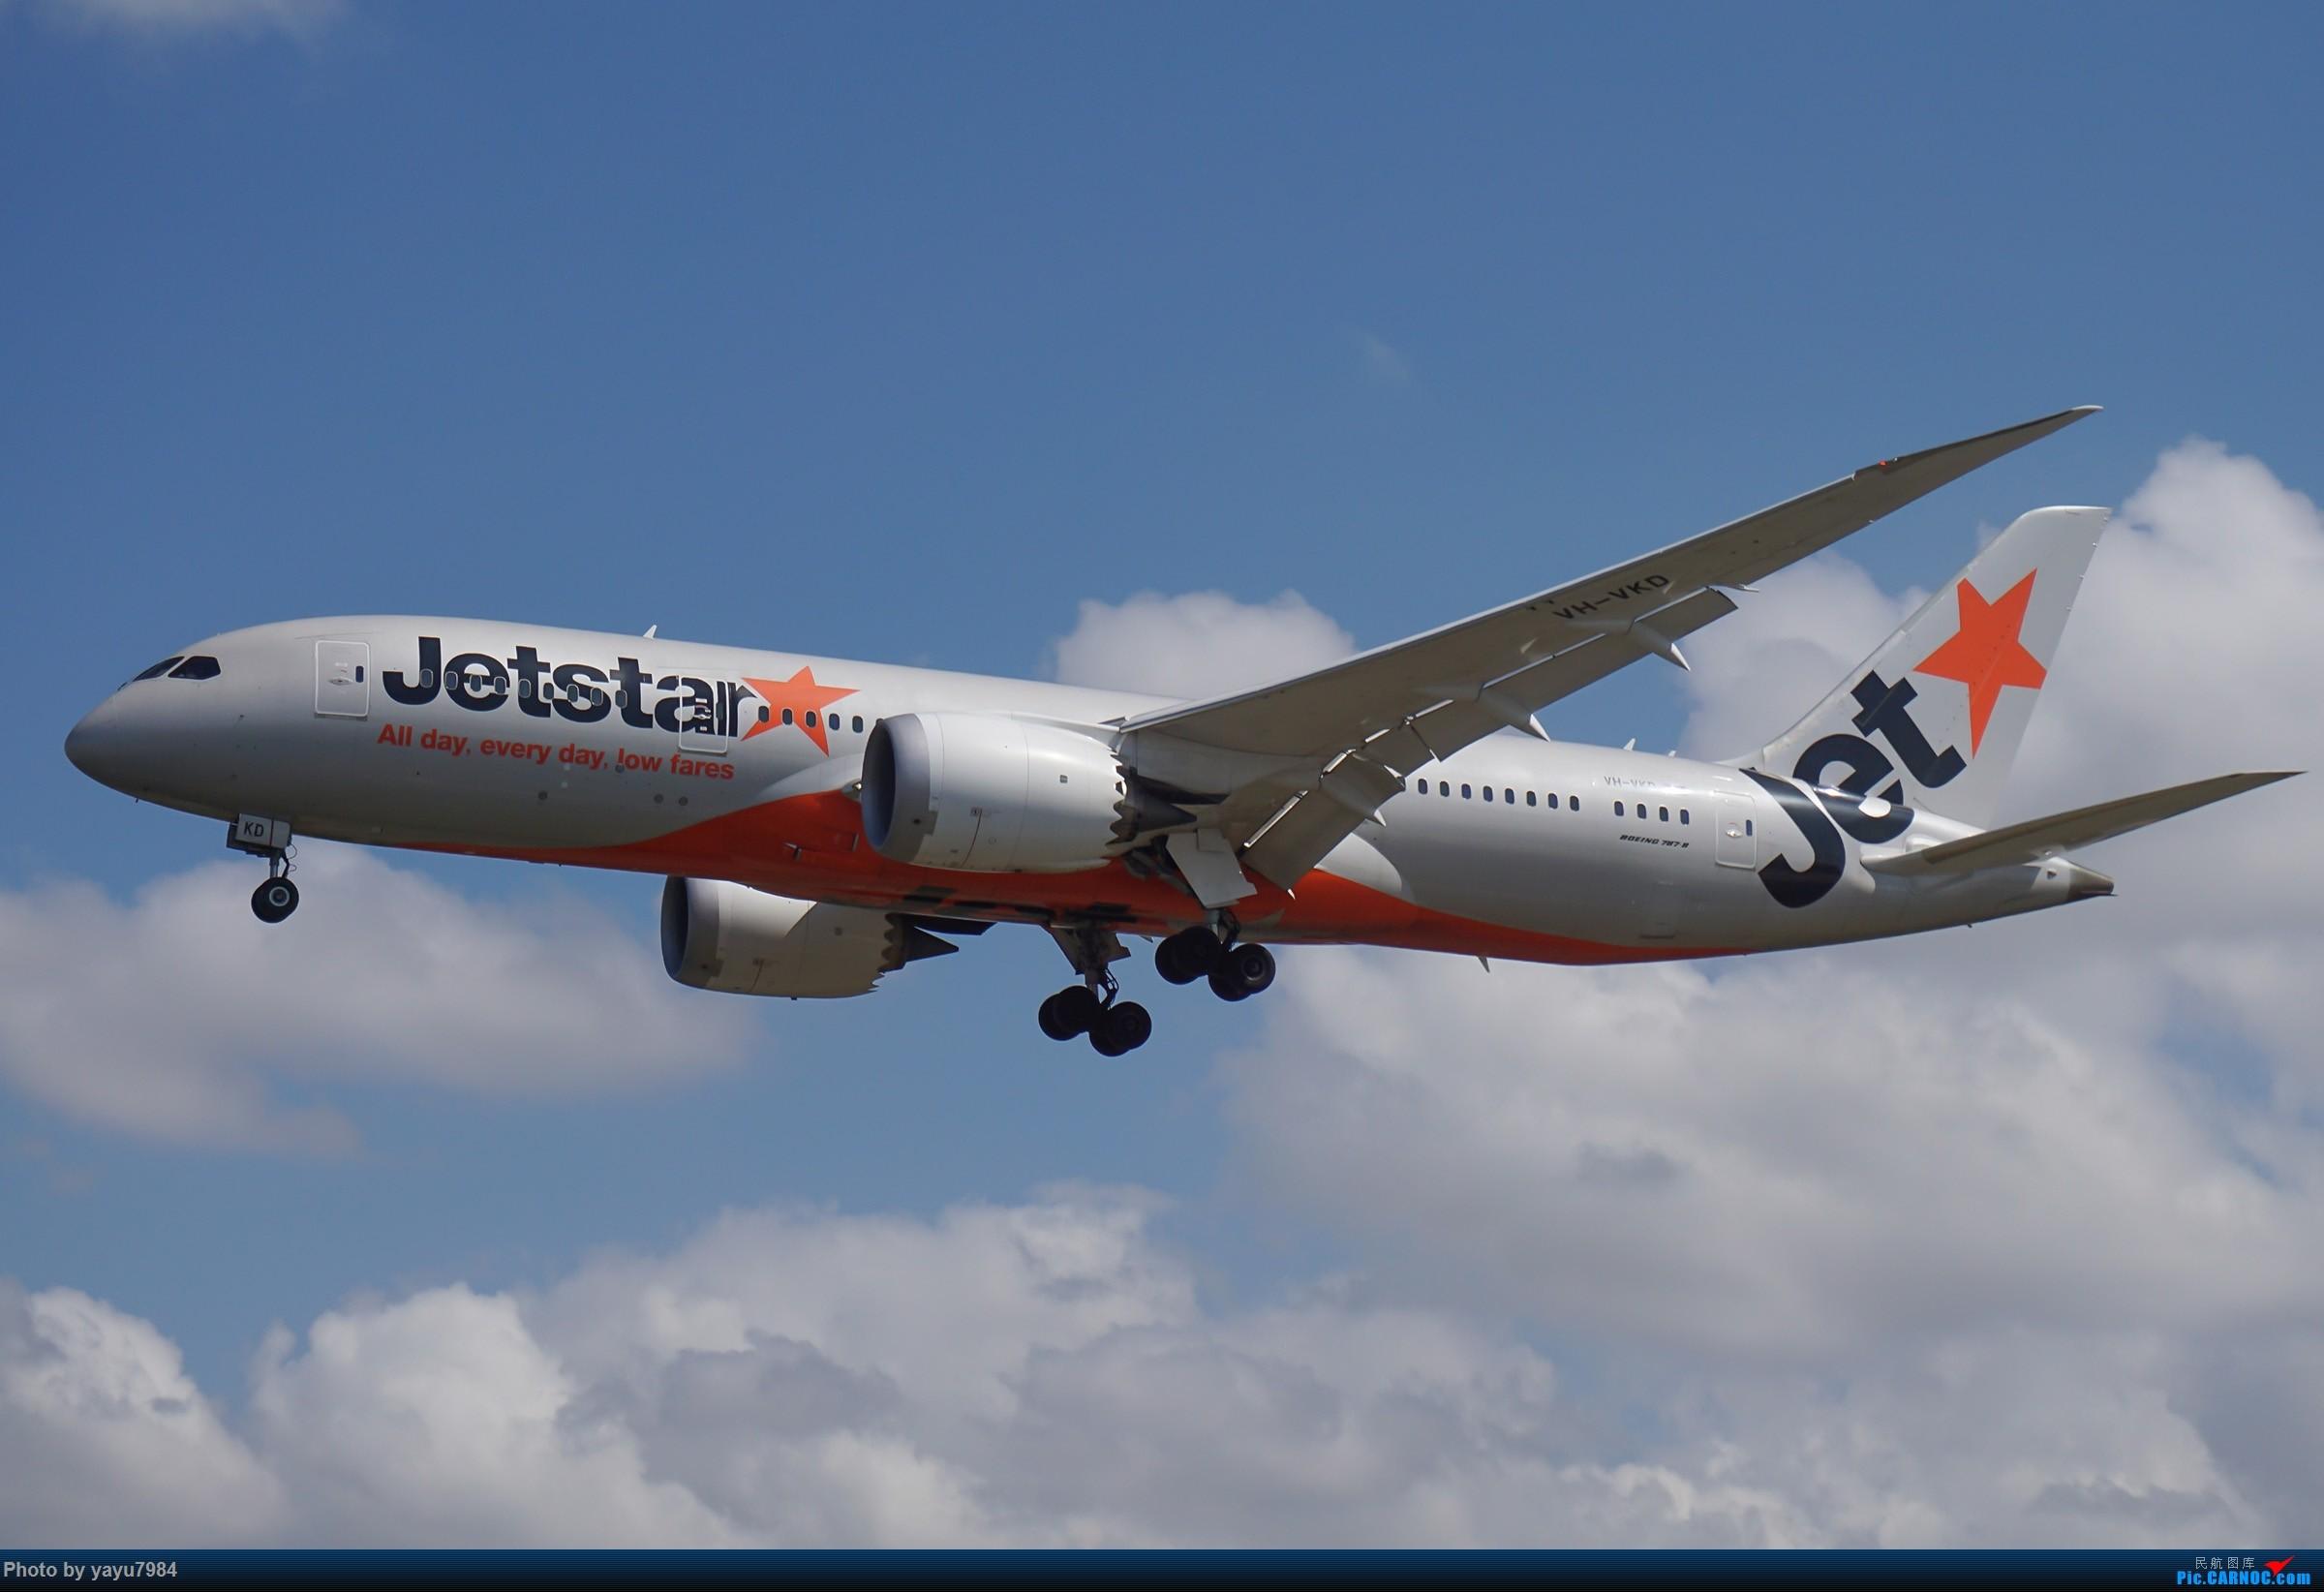 Re:[原创][SYD] 东航天合332,雪绒花343,华航蓝鹊,以及其他日常货 BOEING 787-8 VH-VKD 澳大利亚悉尼金斯福德·史密斯机场